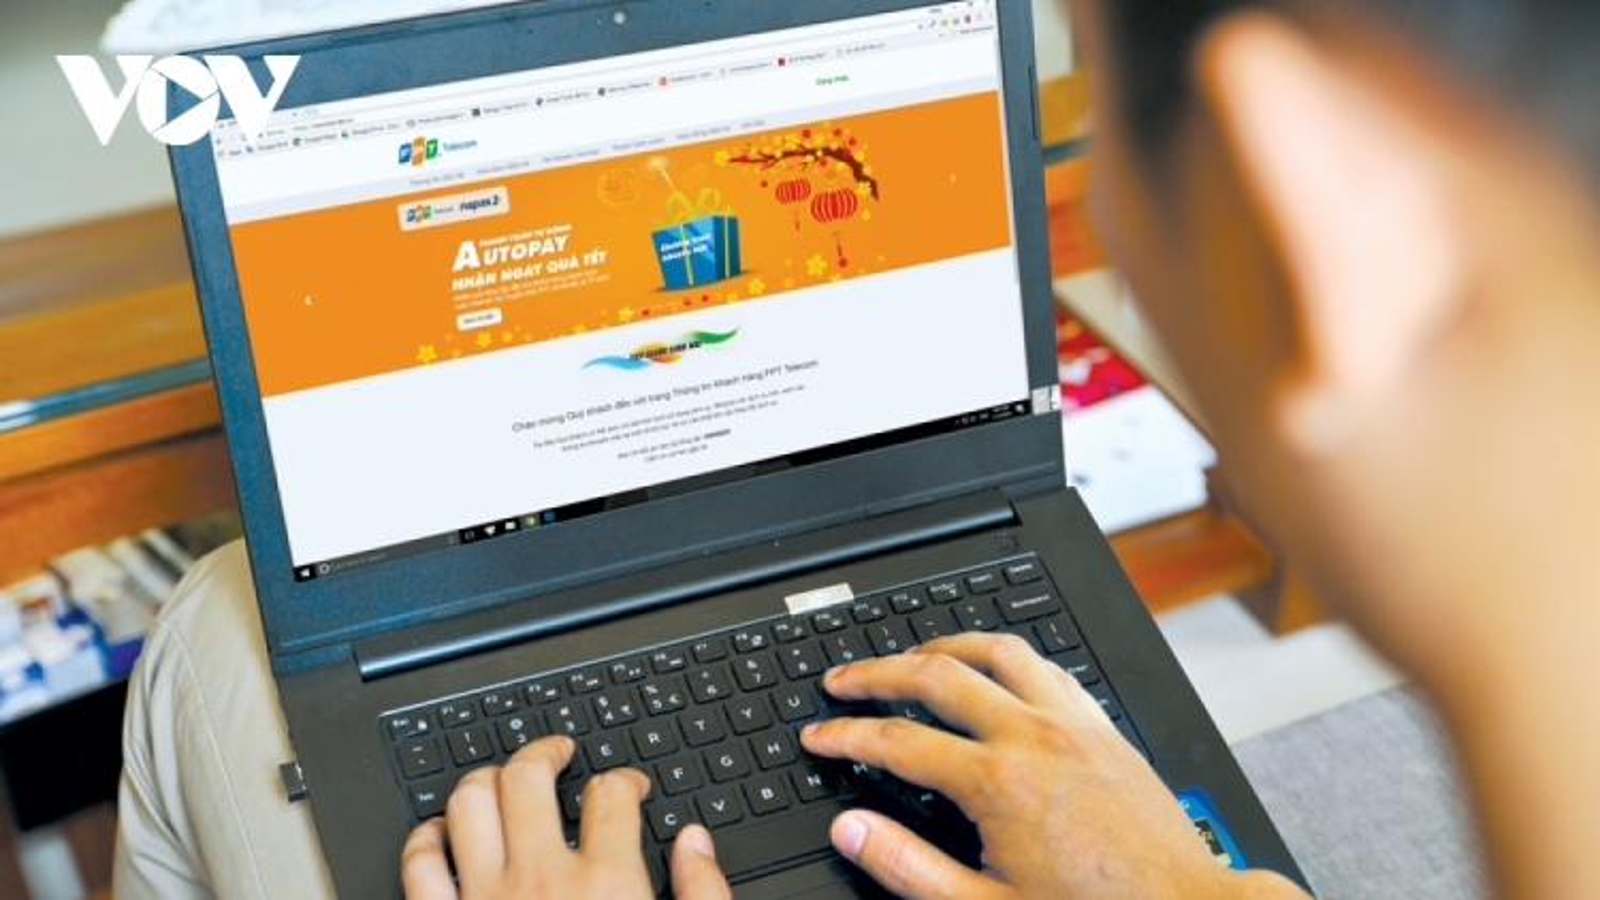 How to optimise FTAs to achieve economic growth through e-commerce